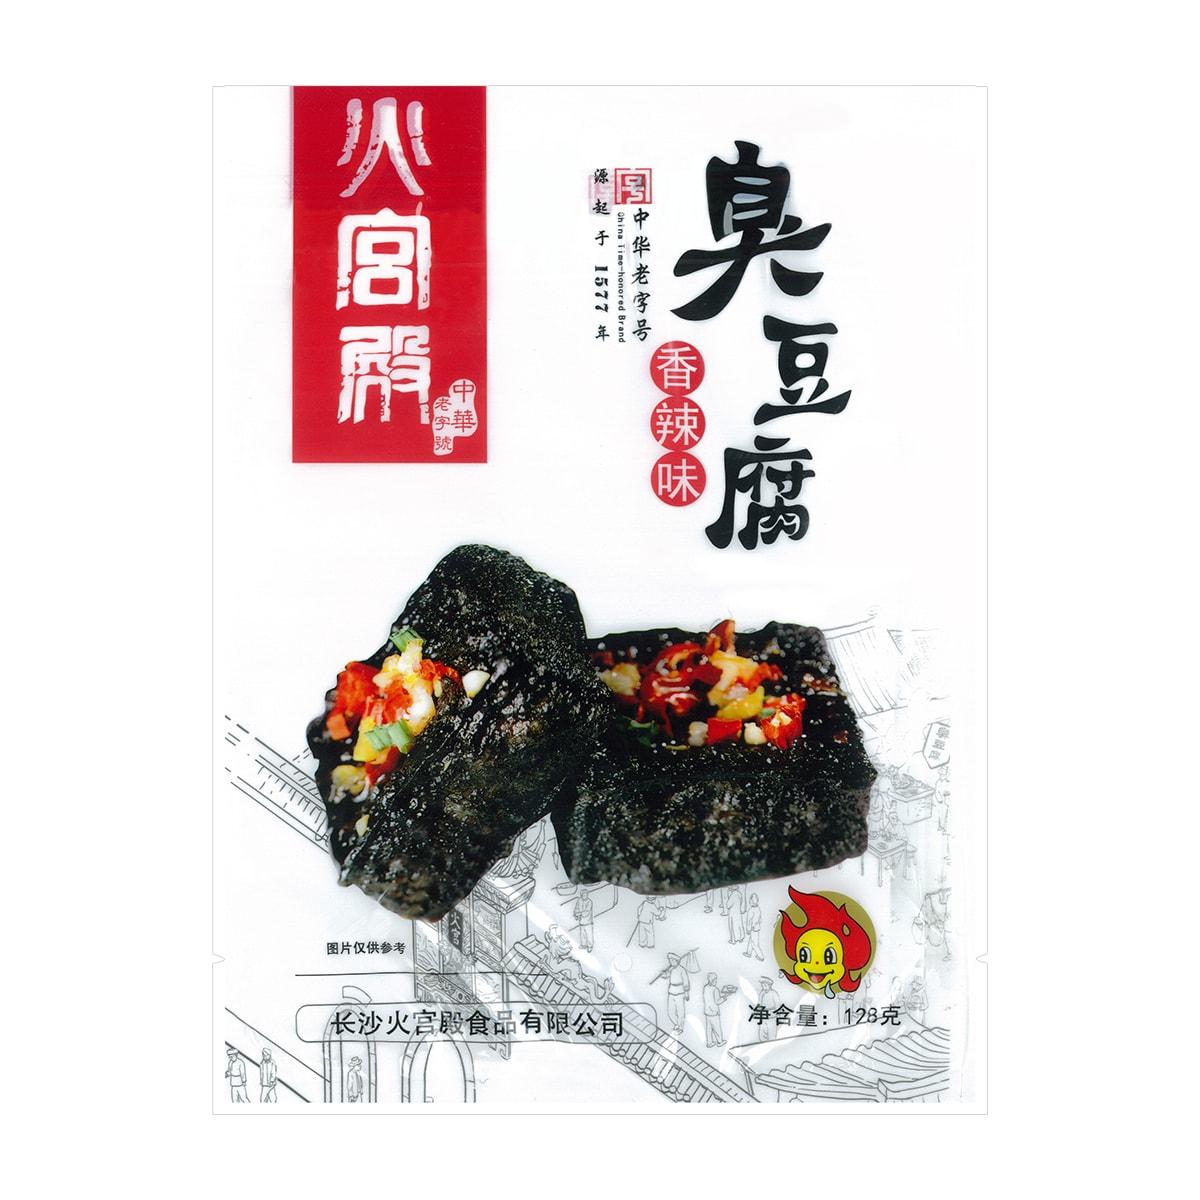 HUOGONGDIAN Stinky Tofu Snack 128g